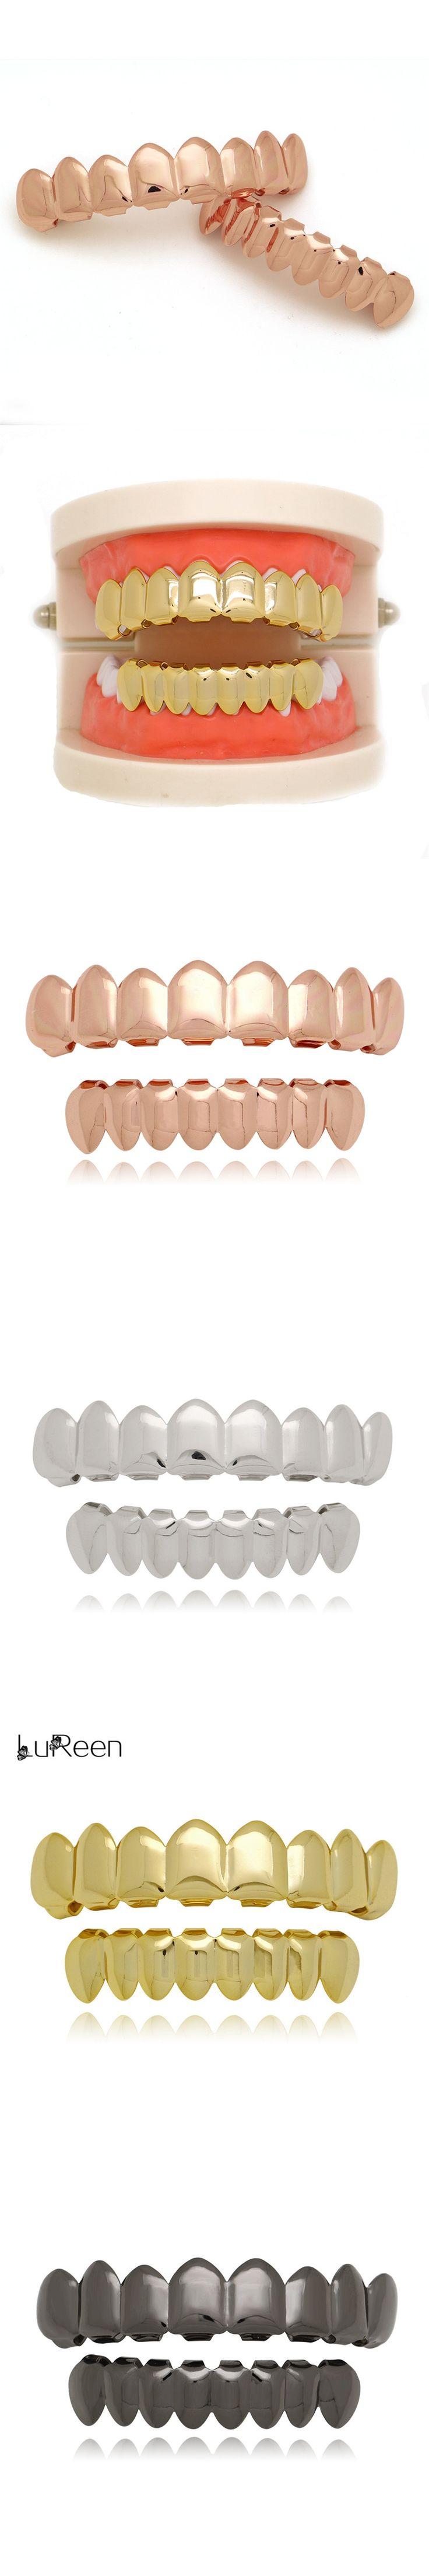 LuReen Fashion Gold Teeth Grillz Hiphop Top & Bottom Grills Dental Punk Halloween Vampire Teeth Caps Jewelry LD0007